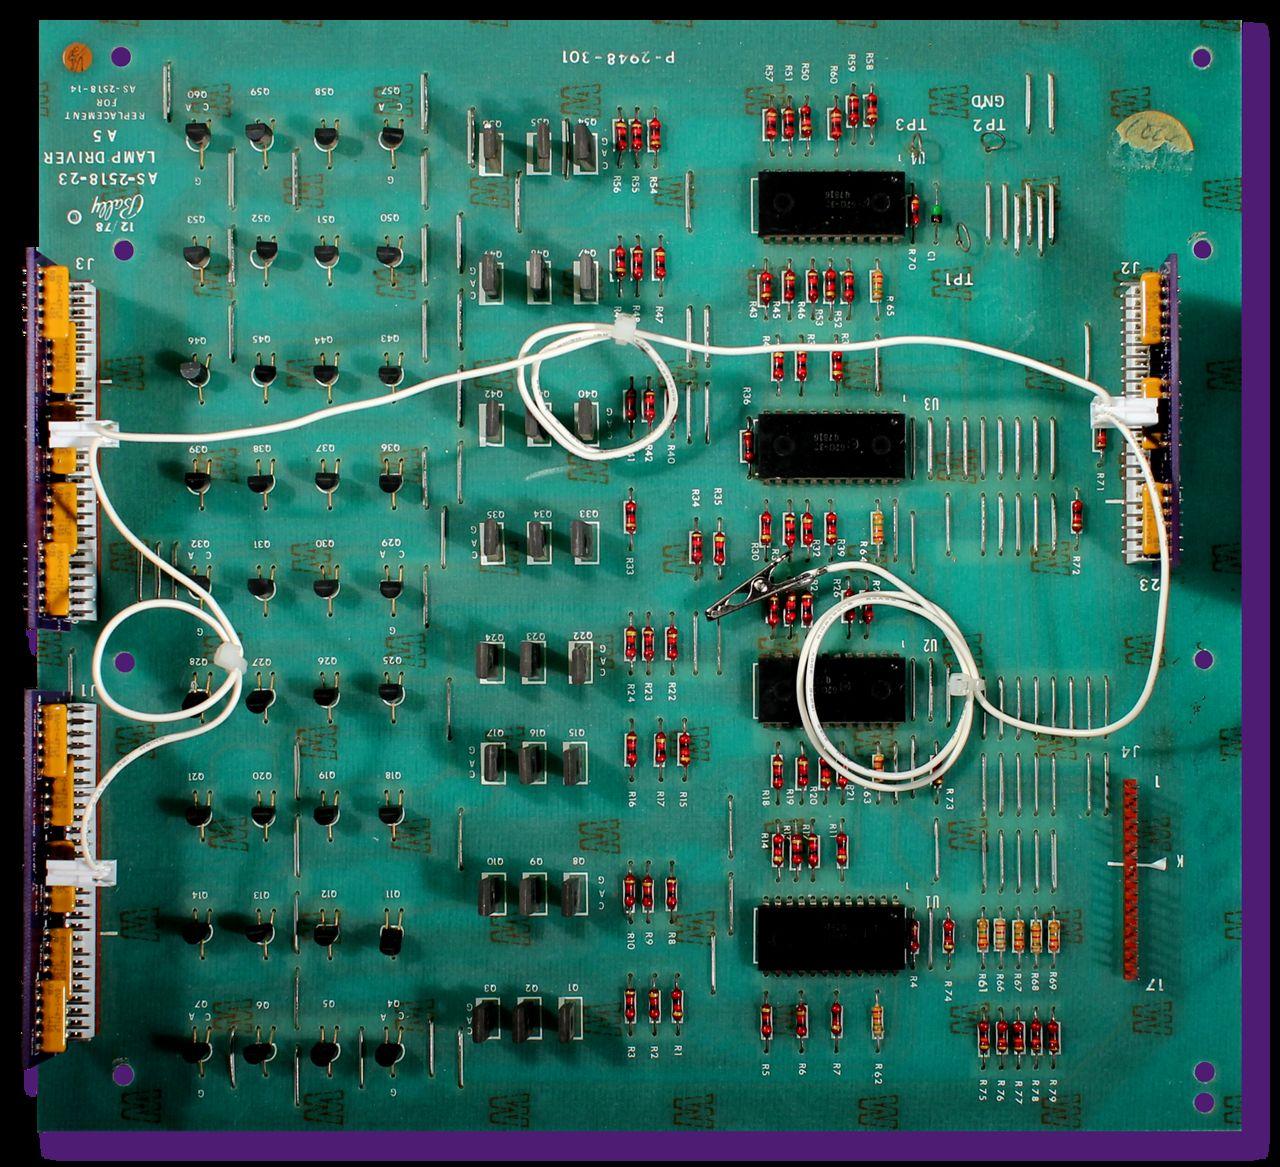 Flickering Led Circuit